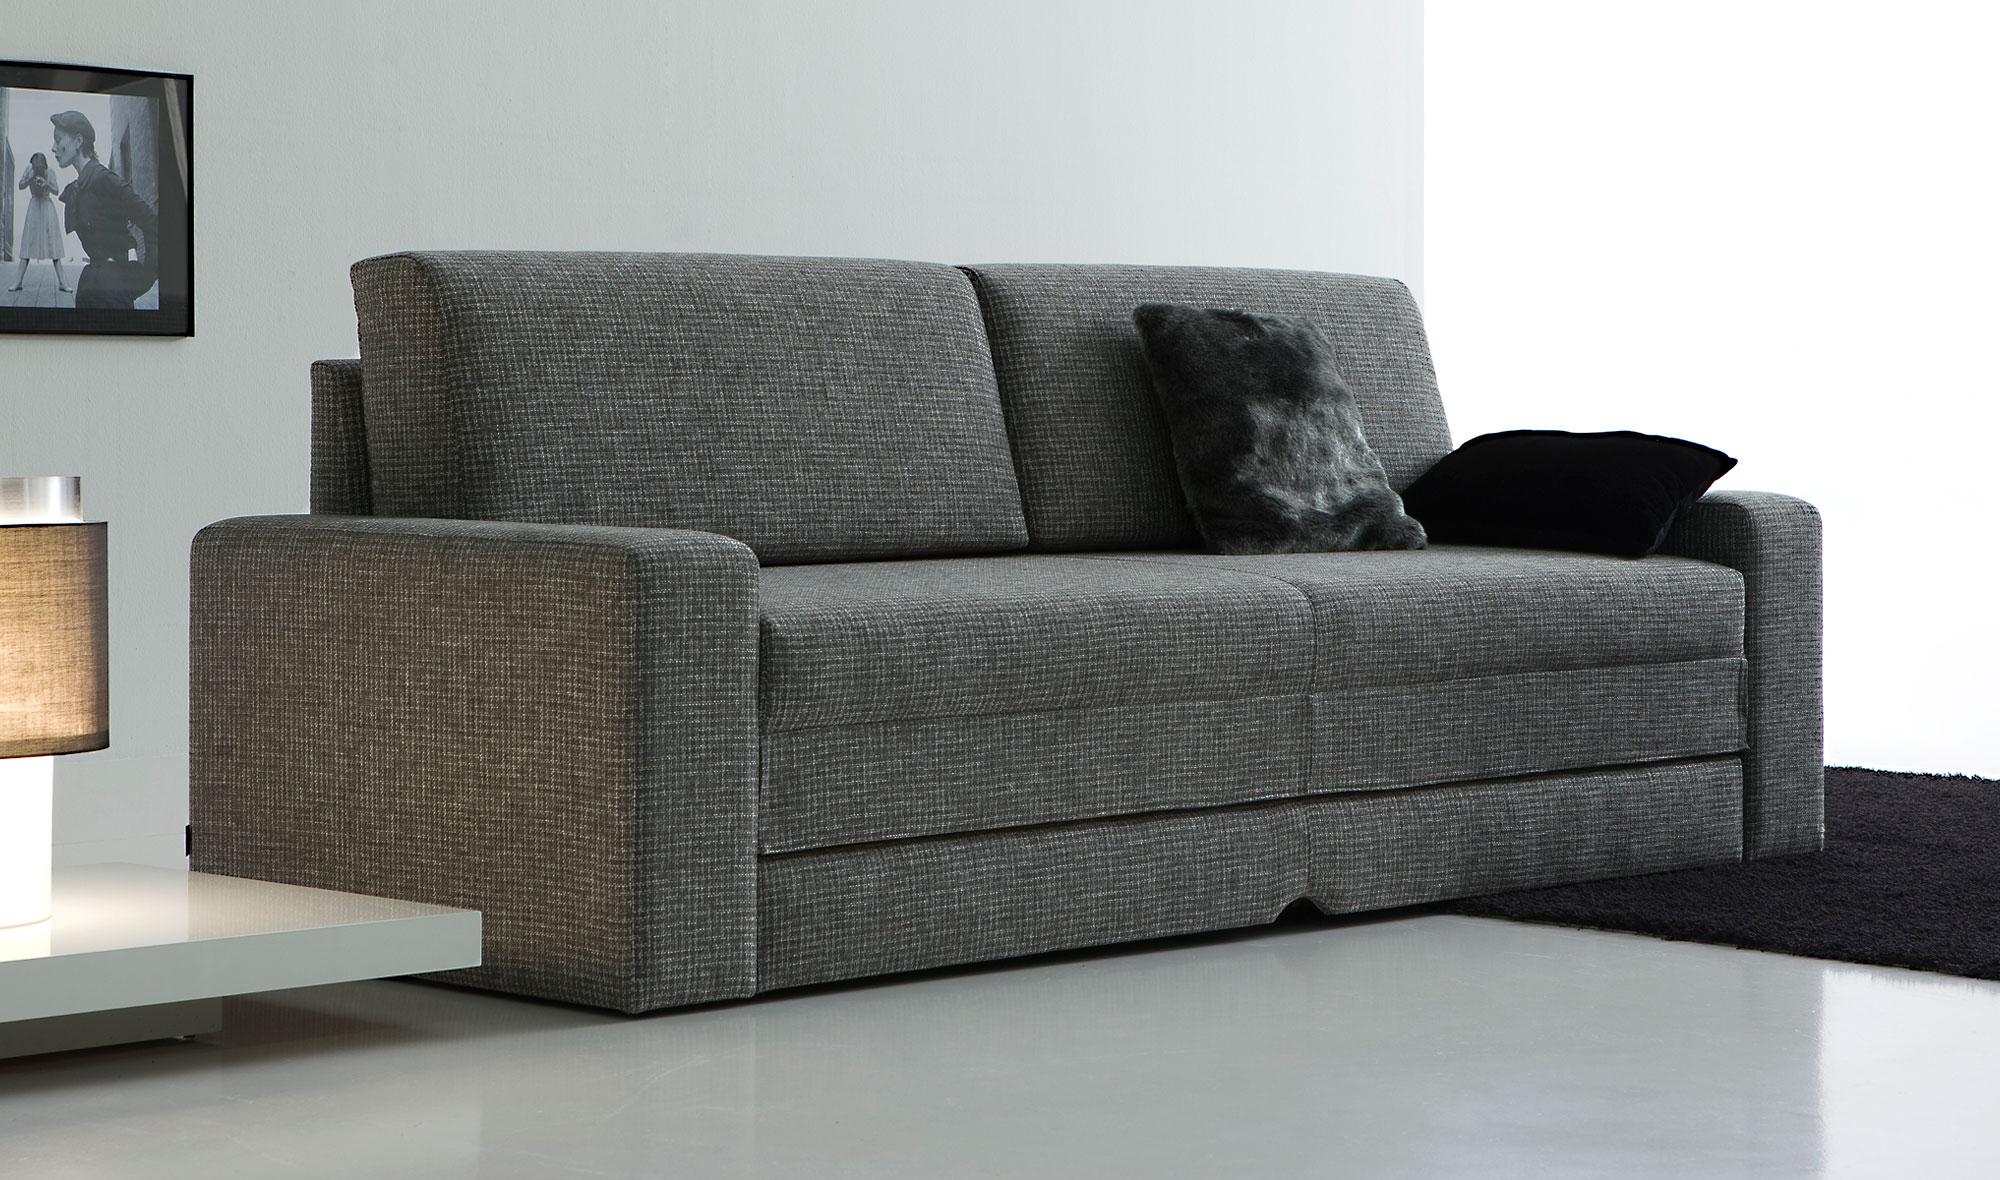 Muebles esquineros modernos cheap muebles finos muebles a for Divan cama completo